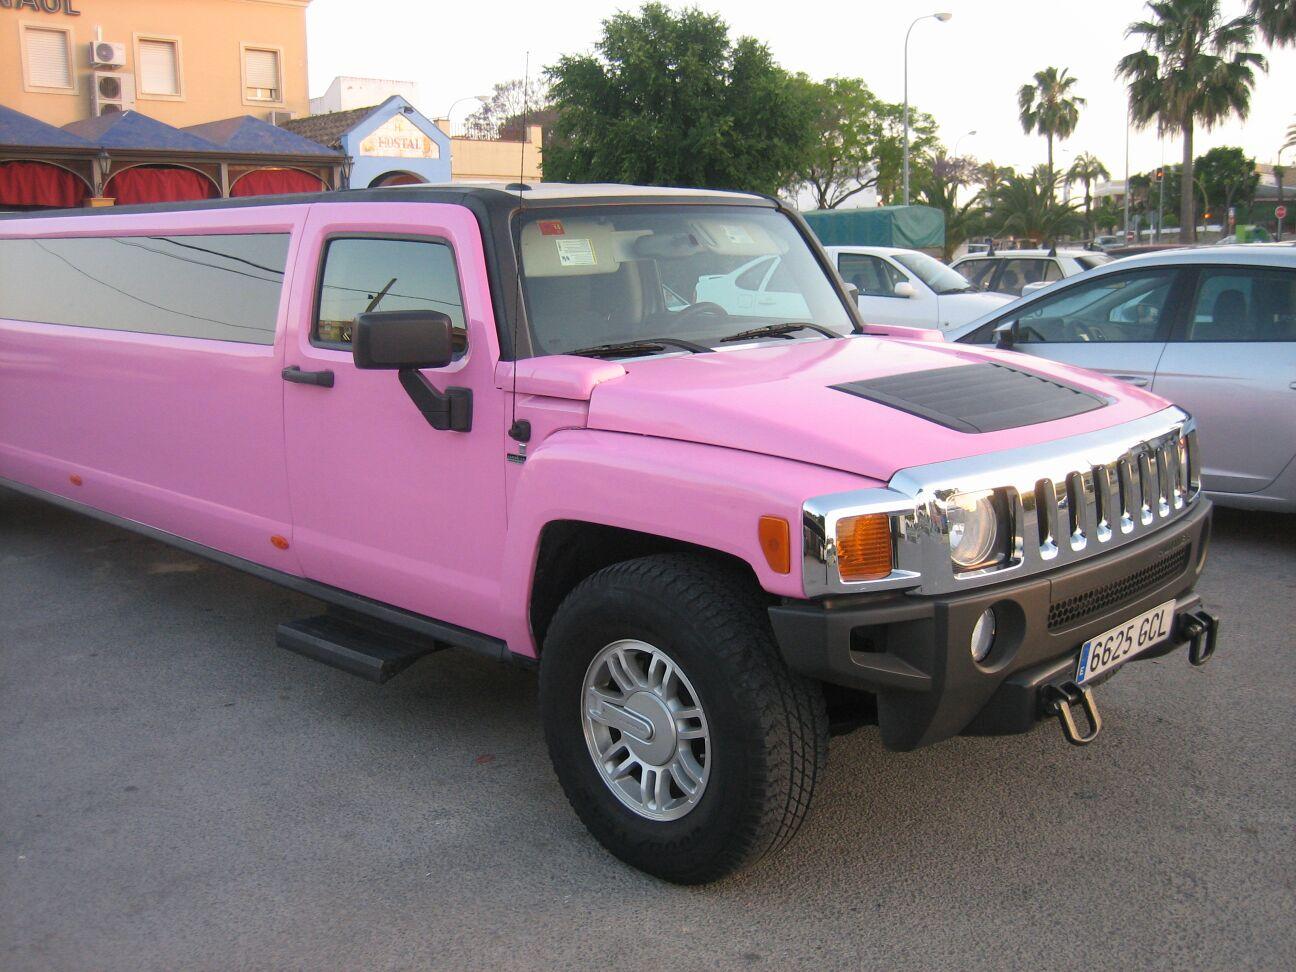 Hummer Rosa 9 Plazas